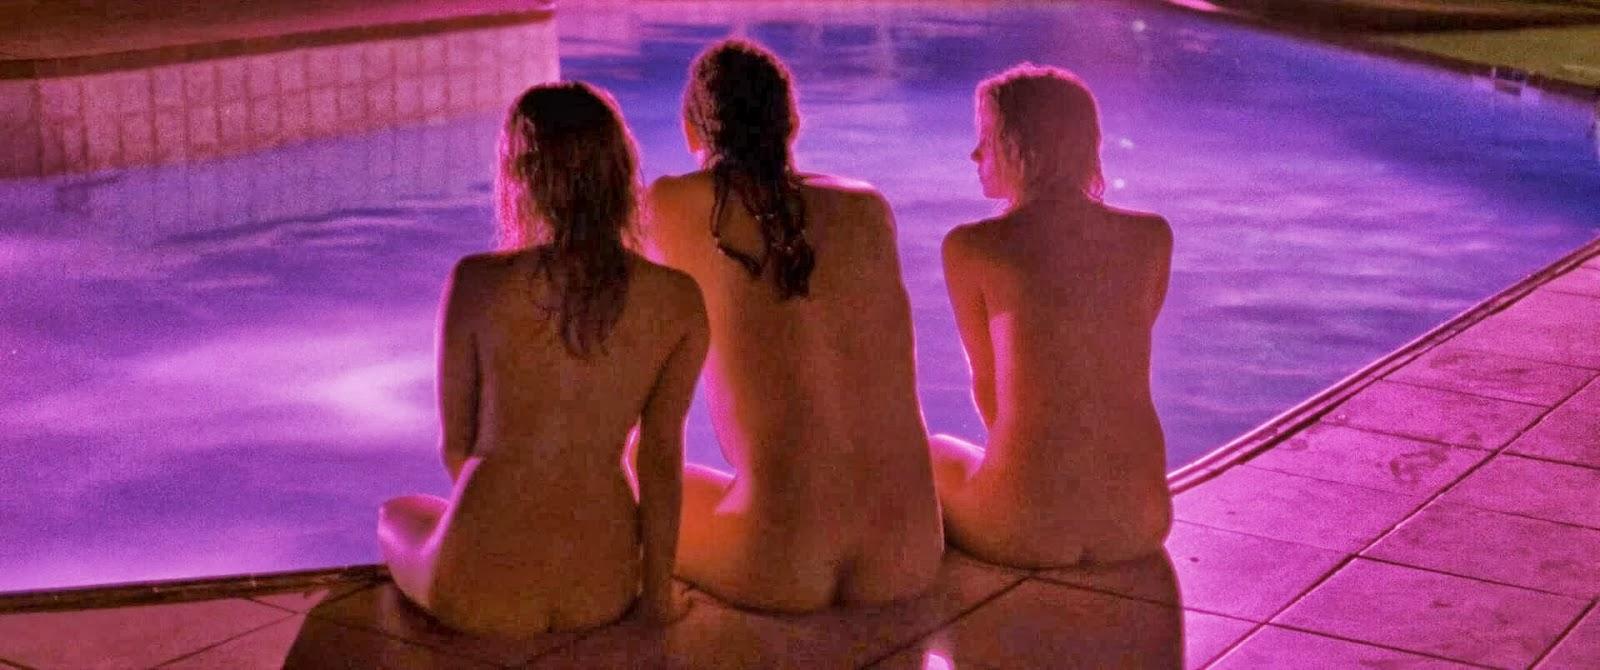 Ashley Benson Nude In Spring Breakers